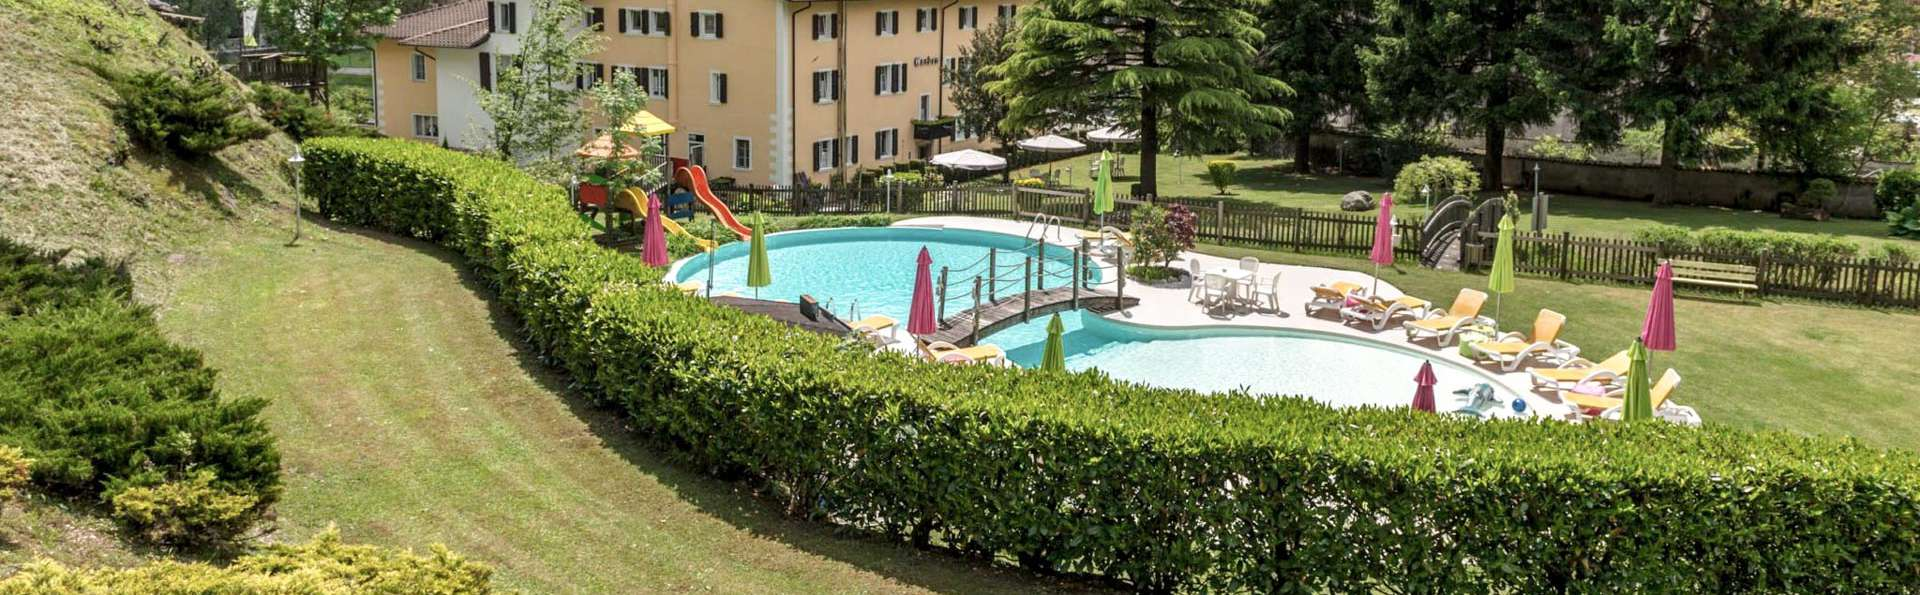 Good Life Hotel Garden - EDIT_NEW_FRONT_01.jpg